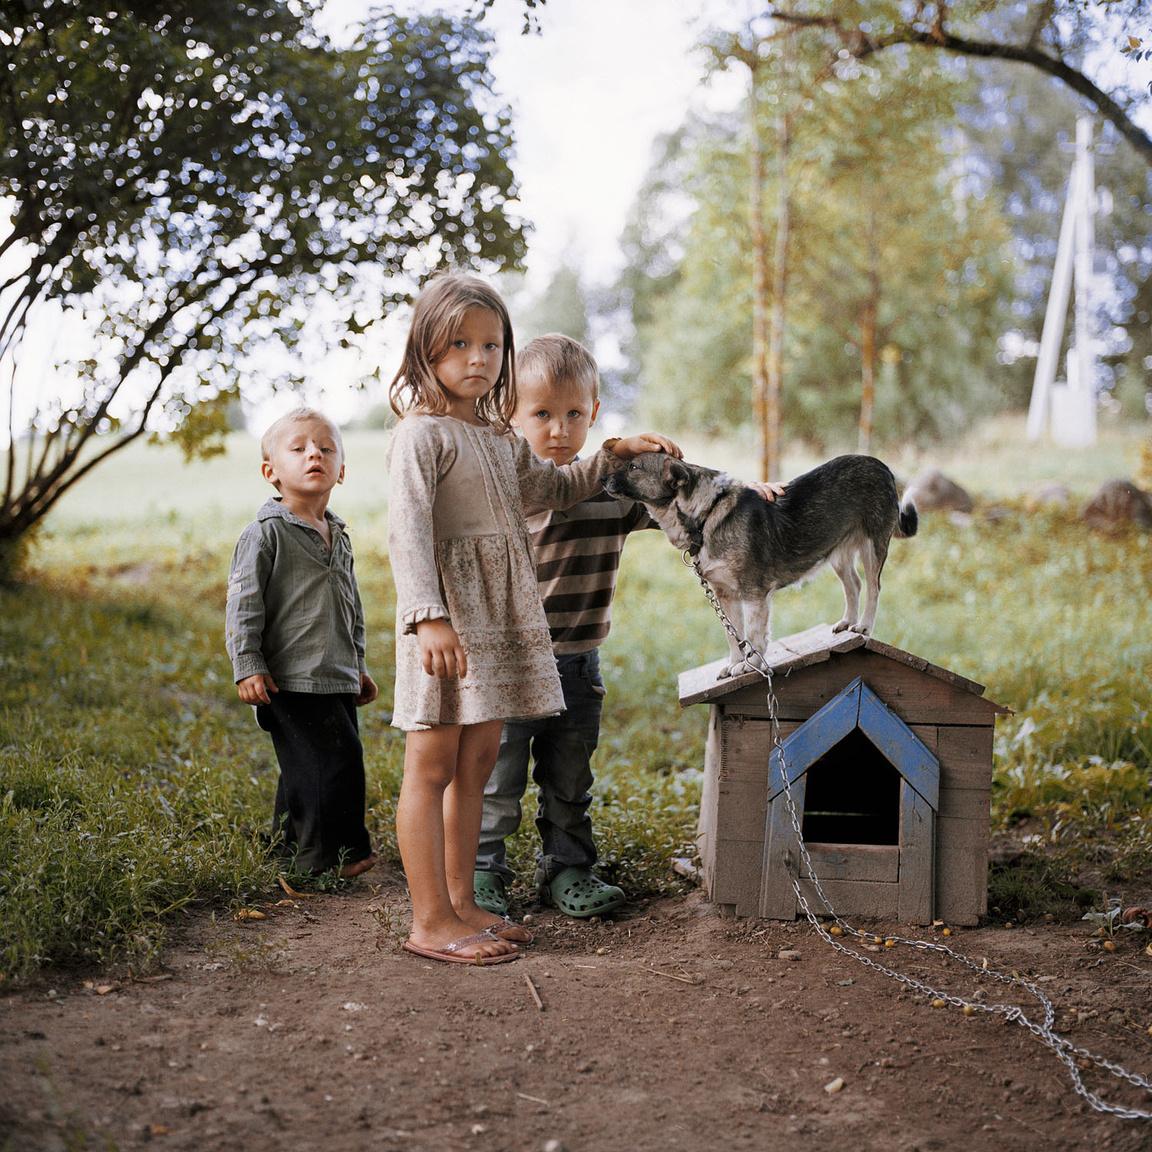 Ugne, Dovydas, Egidijus és Meskis kutya.